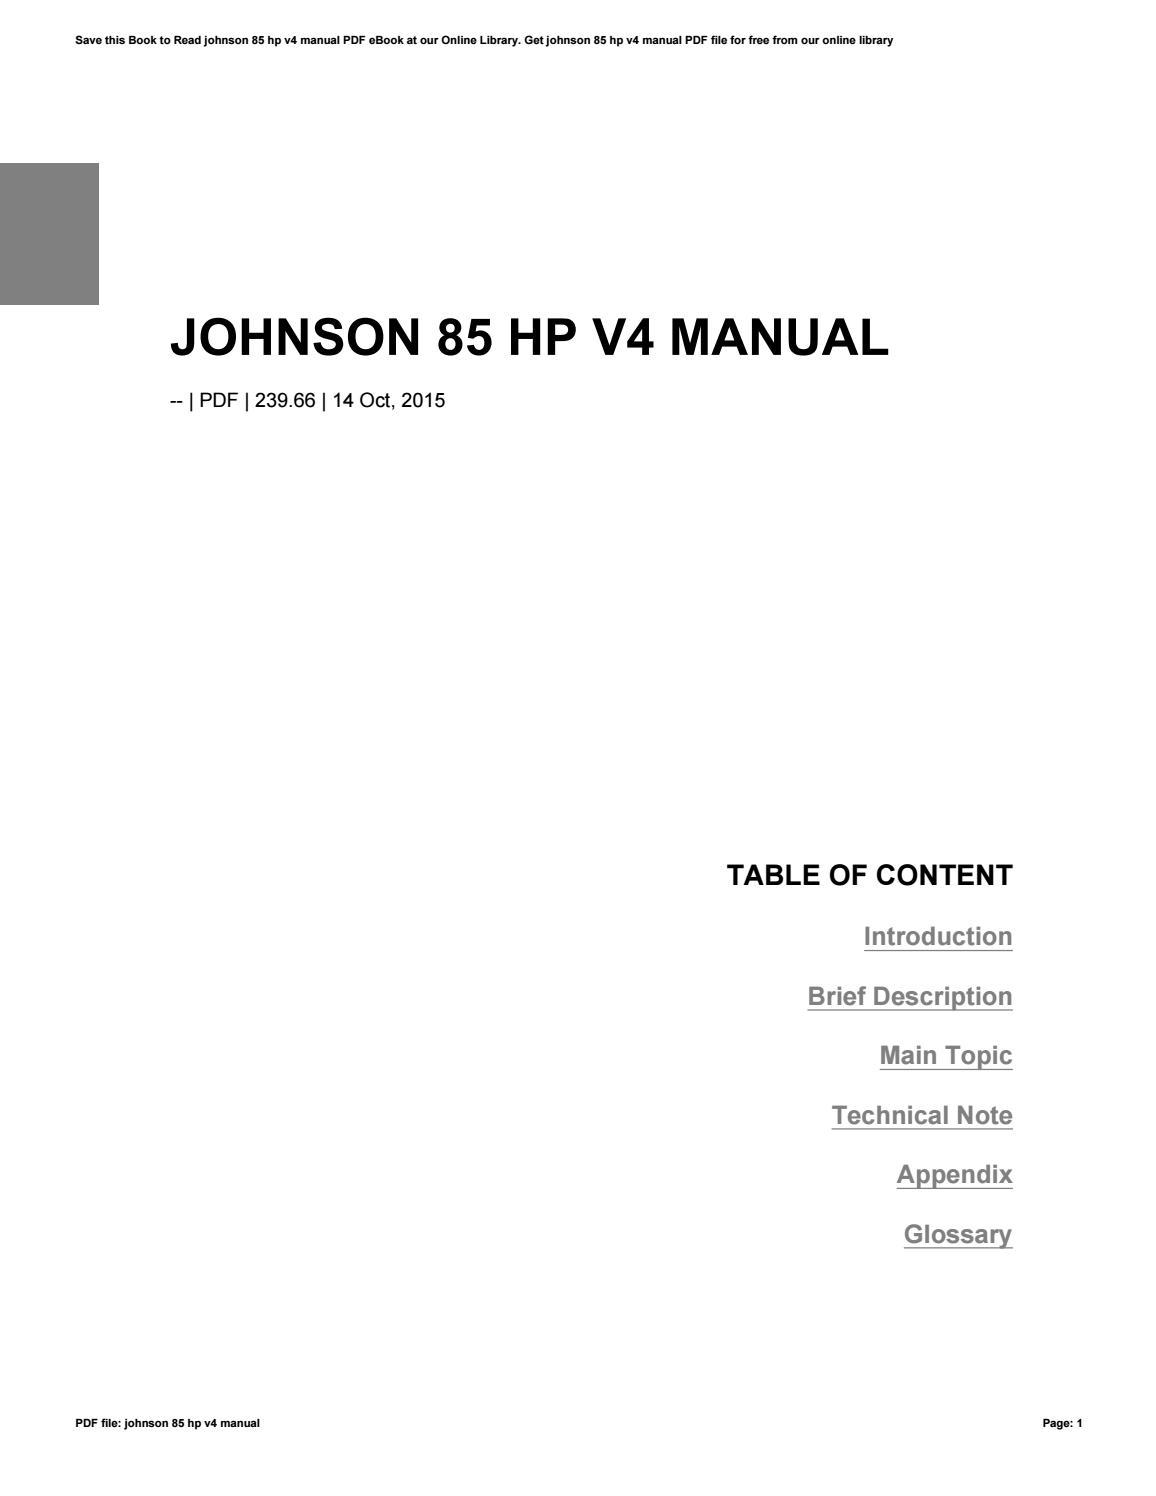 Johnson 85 Hp V4 Manual Ebook Diagram Of Honda Generator Parts Ex800 A Jpn Vin G100 Evinrude Array By Barryogorman36 Issuu Rh